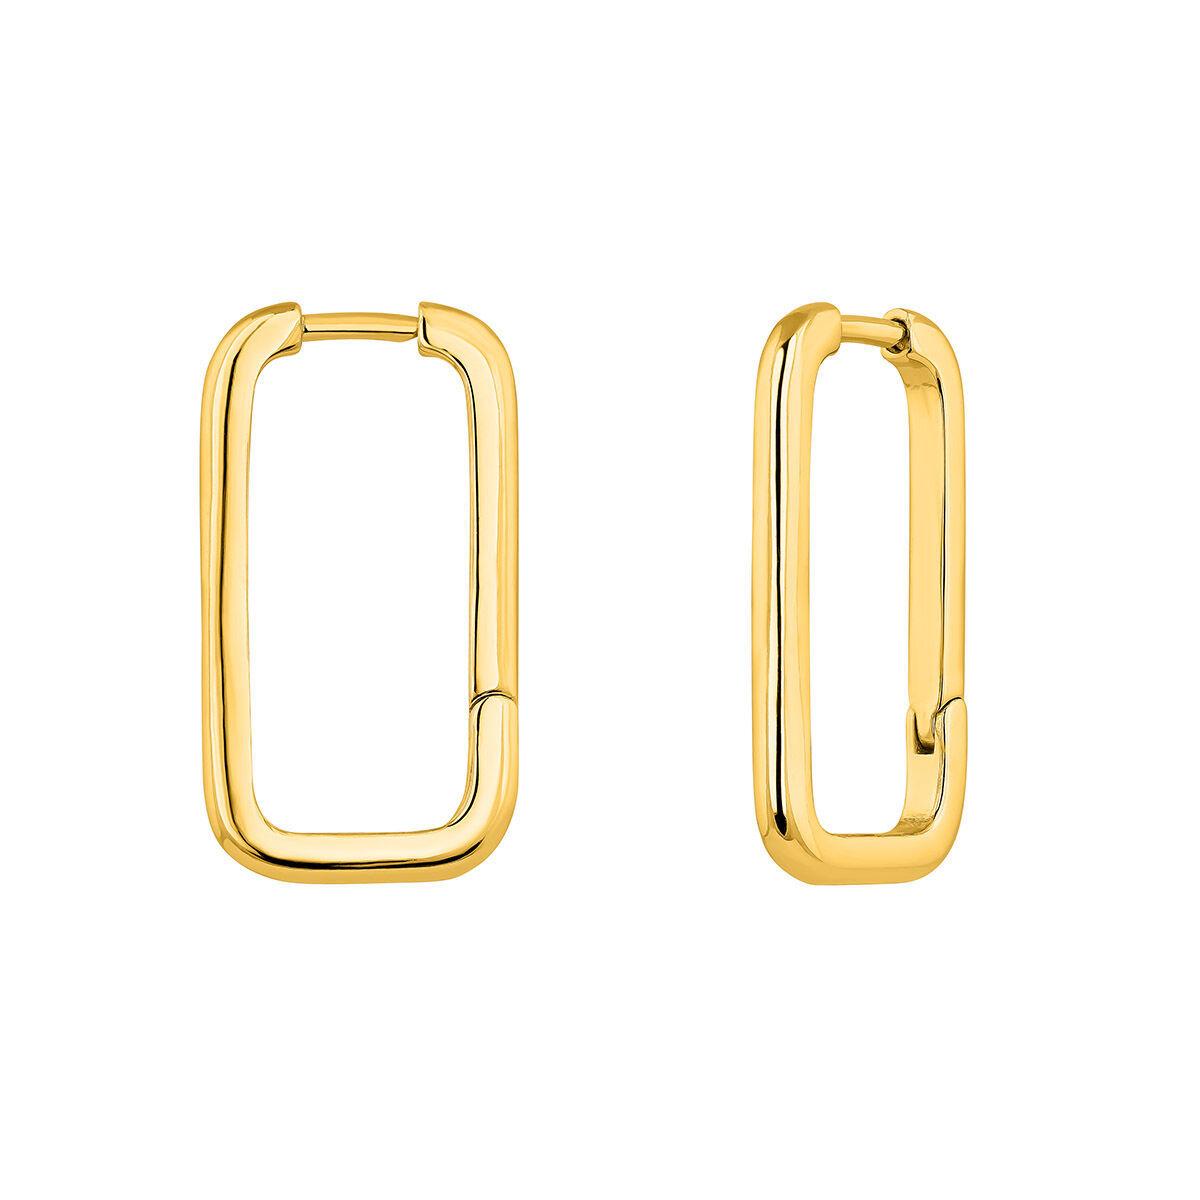 Nos gustan estos aros de plata bañada en oro de Aristocrazy (69 euros). Un toque estructural perfecto con este look impecable.